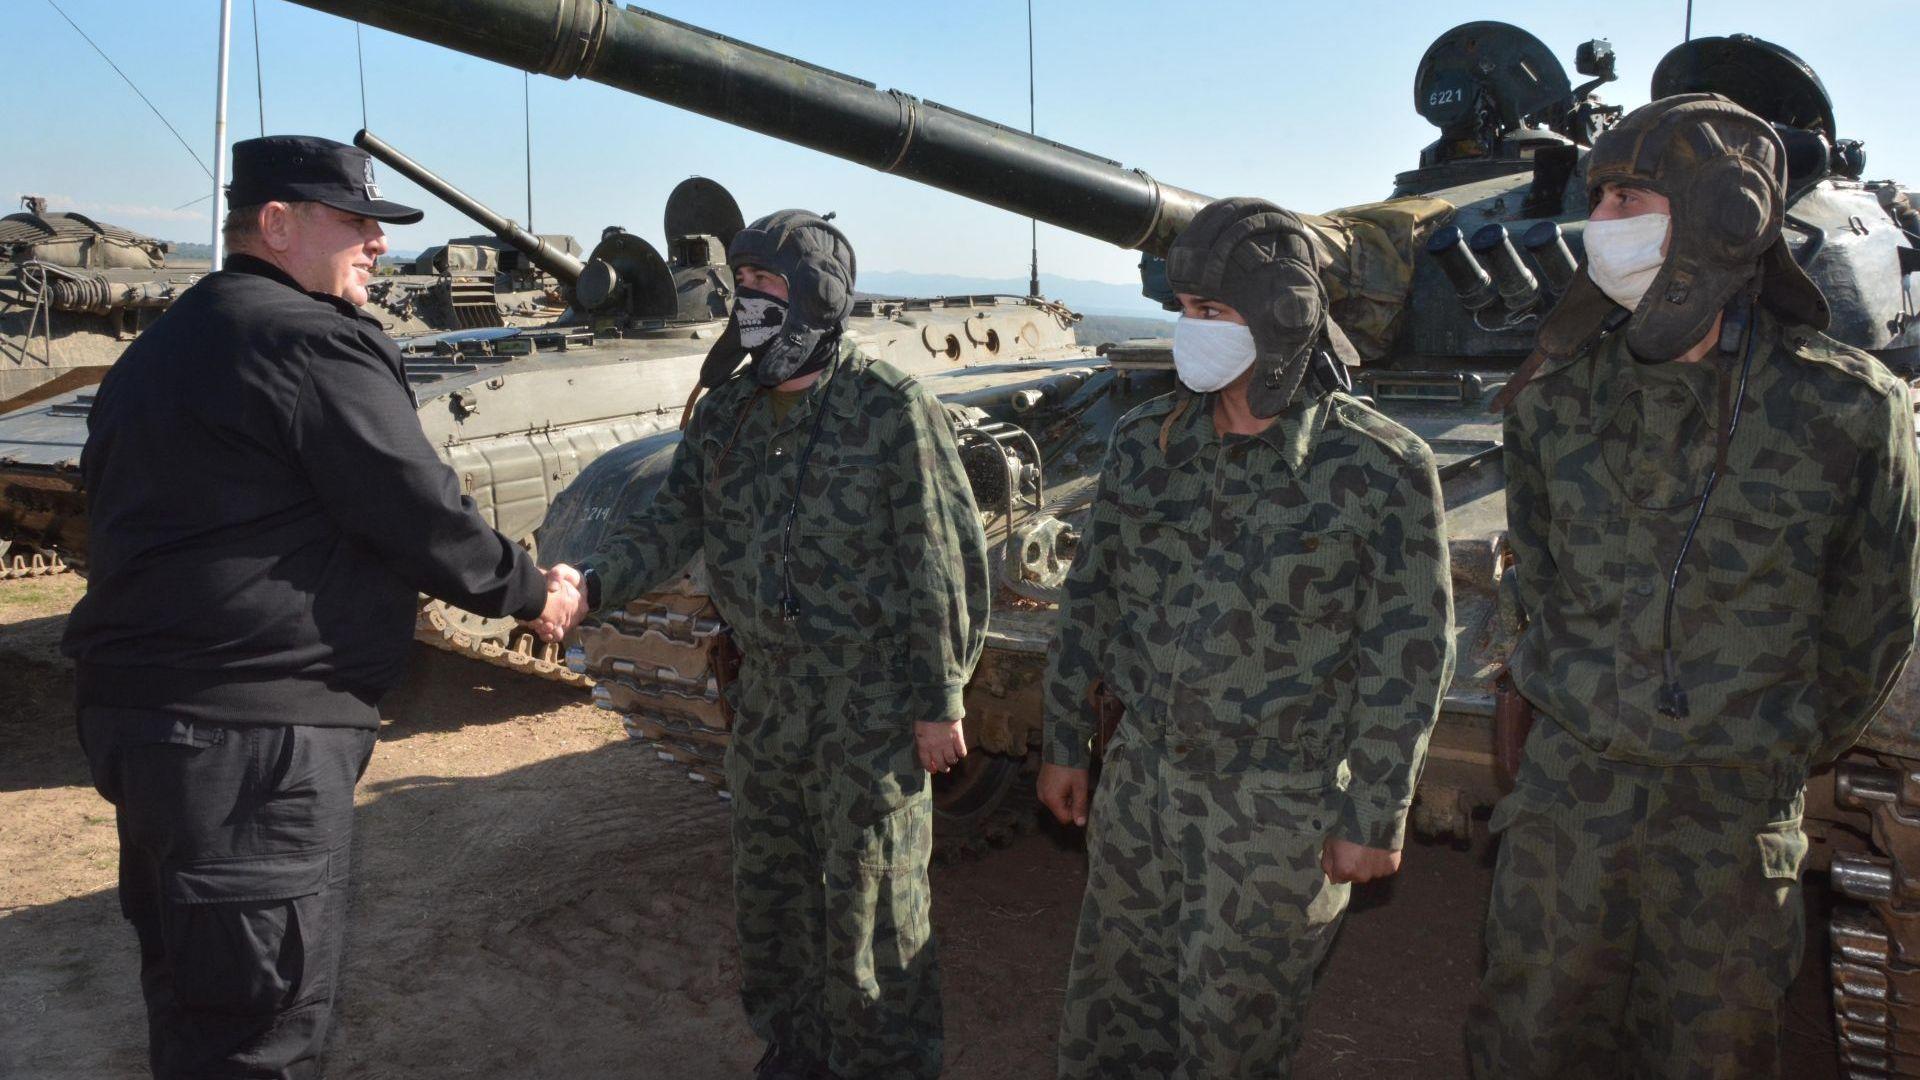 Каракачанов отчете само 233 военнослужещи, заразени с коронавирус